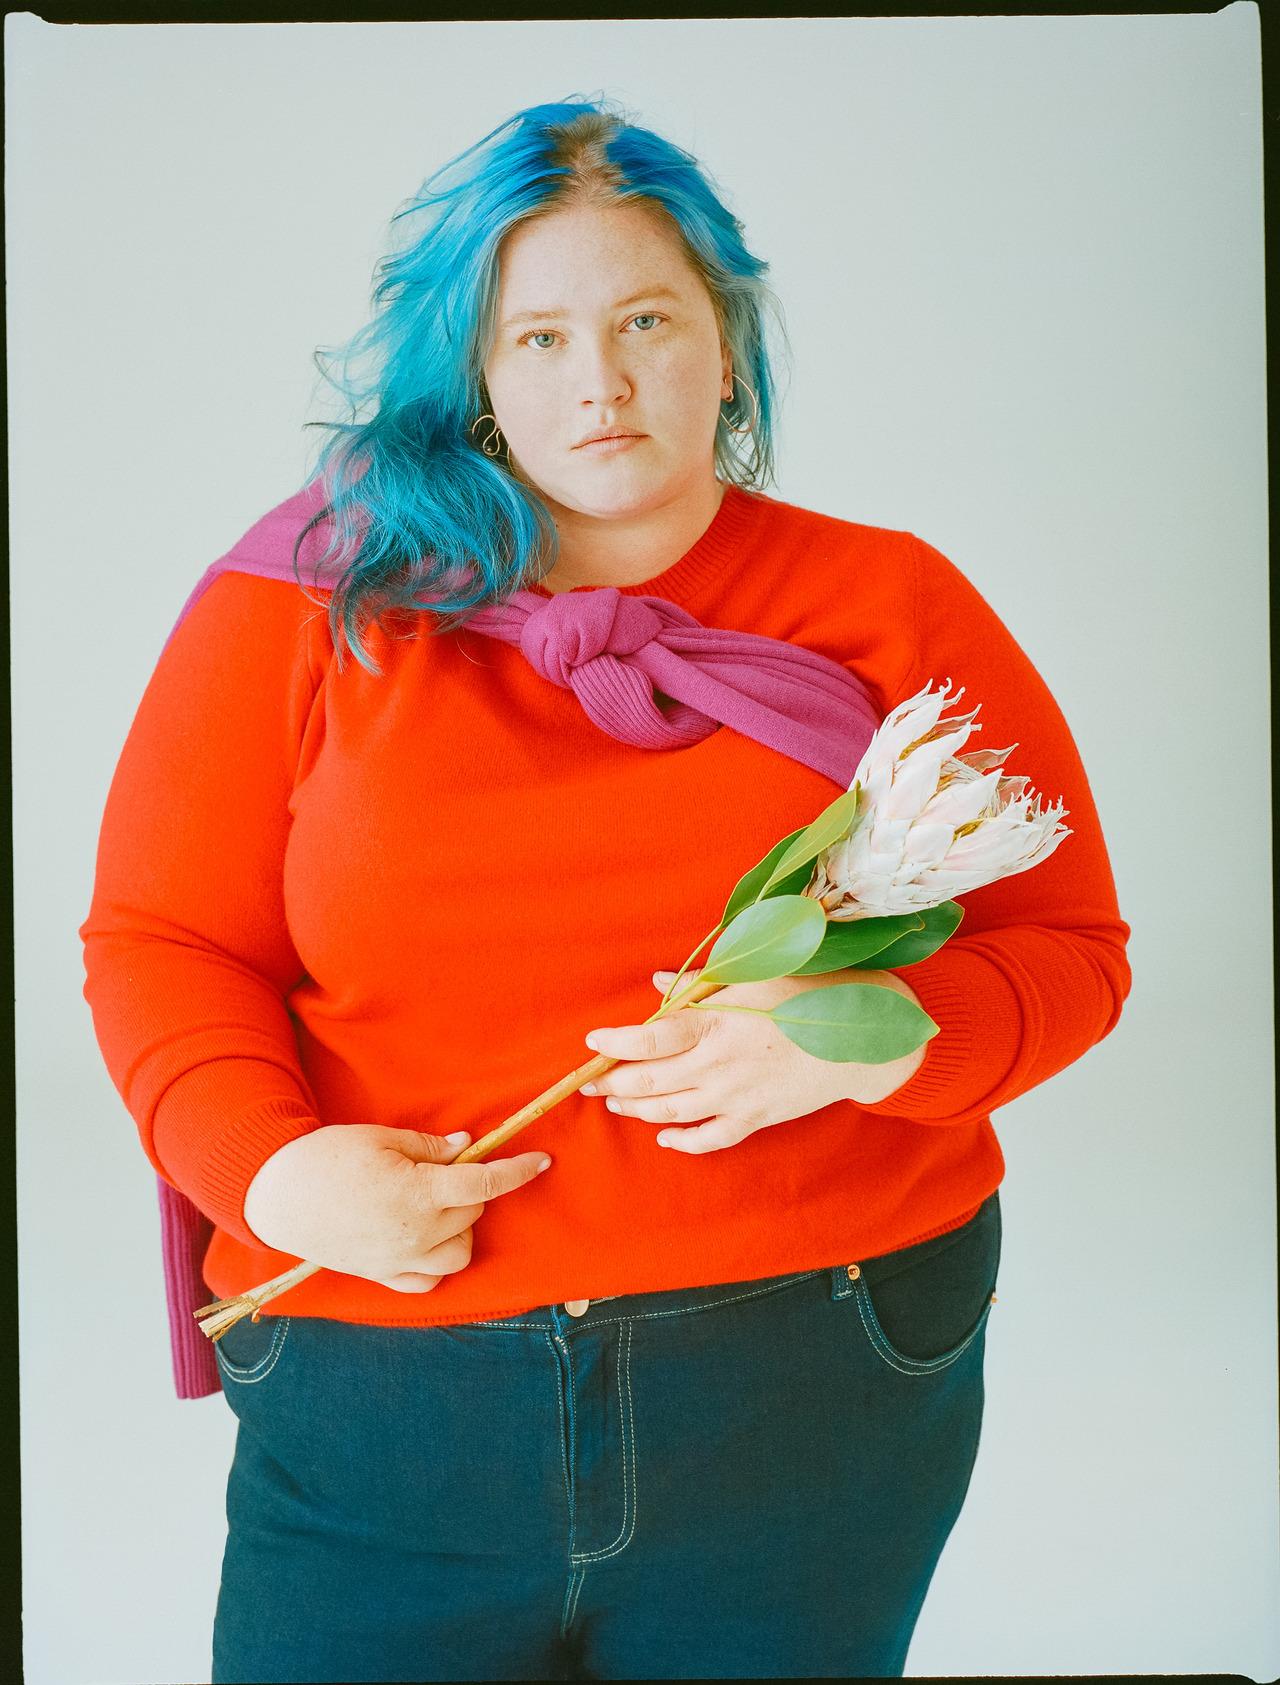 Photographer Tiffany Dawn Nicholson for Universal Standard Advertorial.